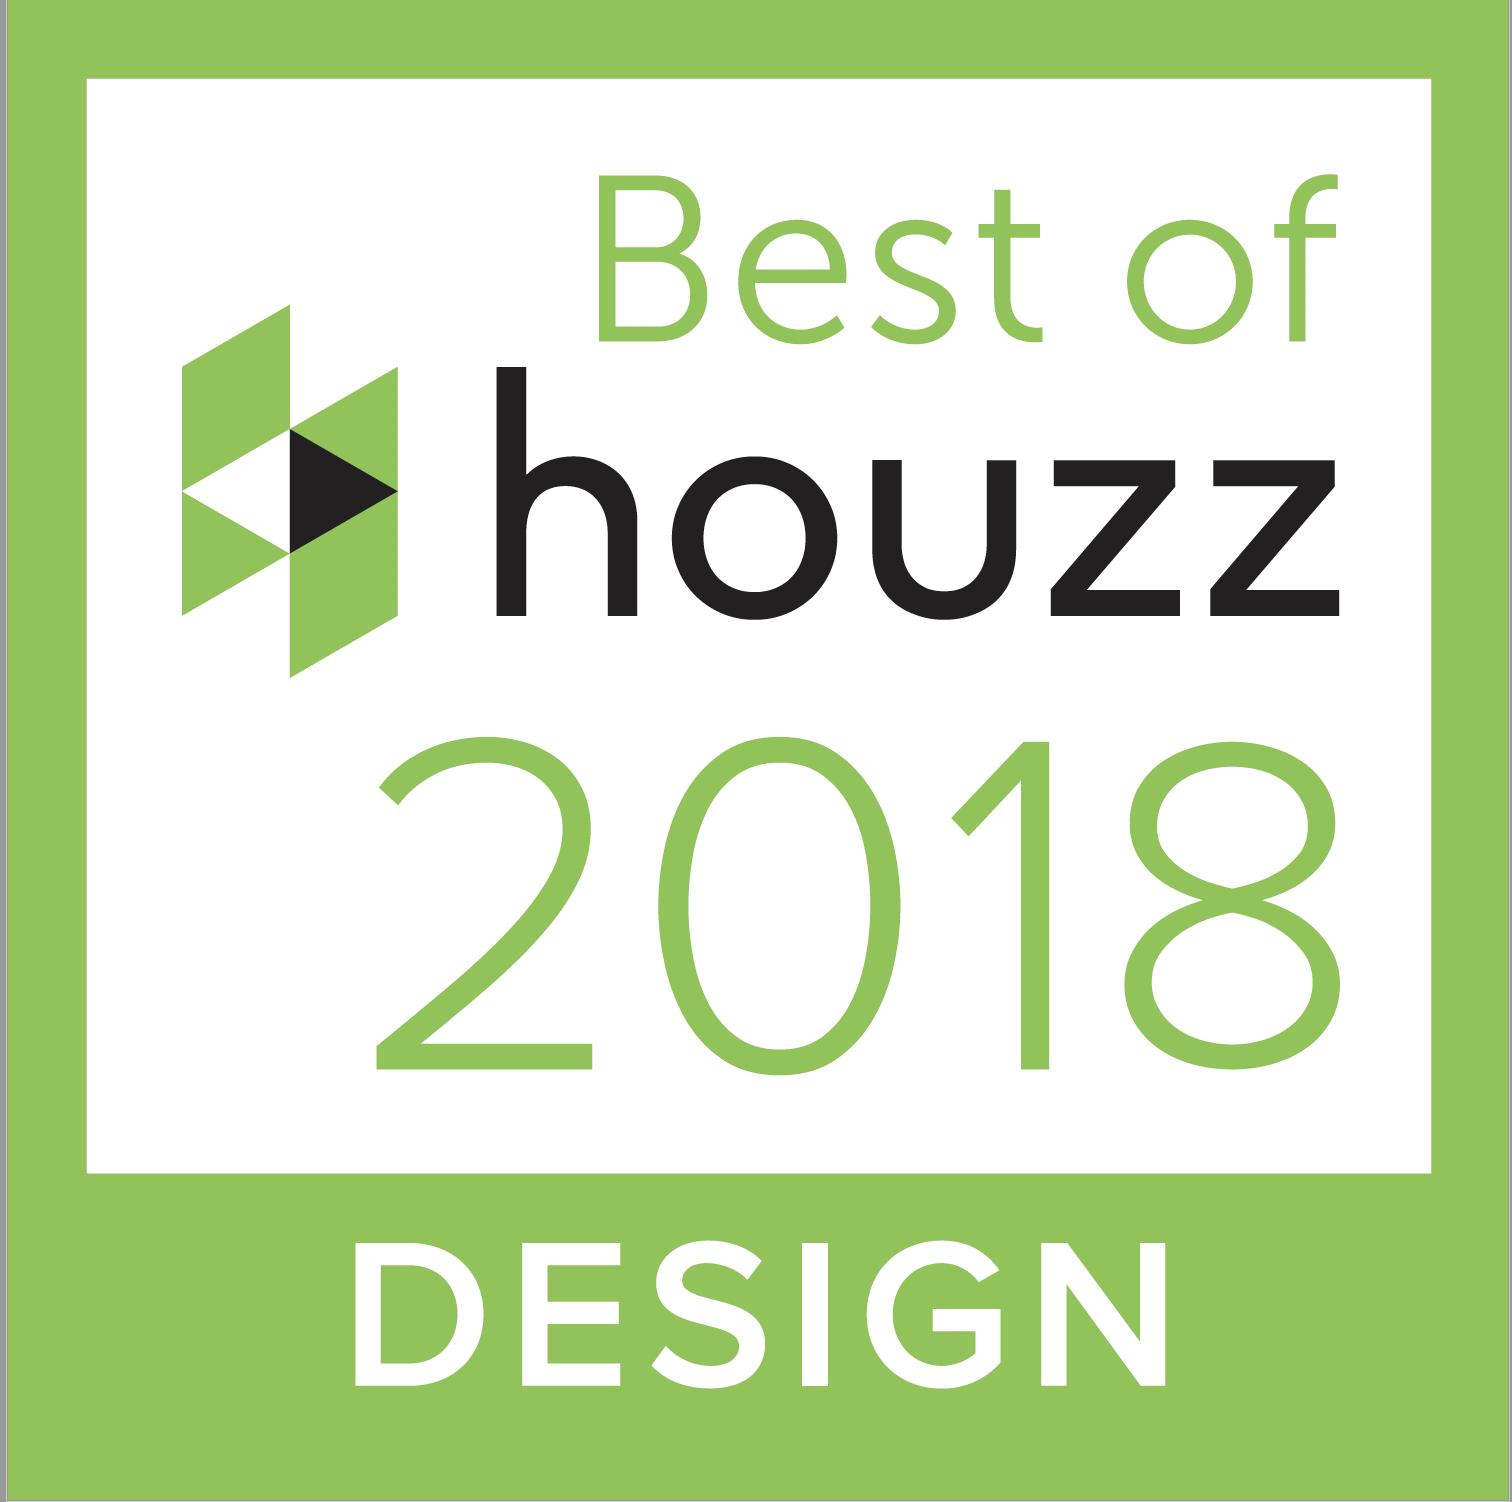 SRJ voted Best of Houzz Design, 2018